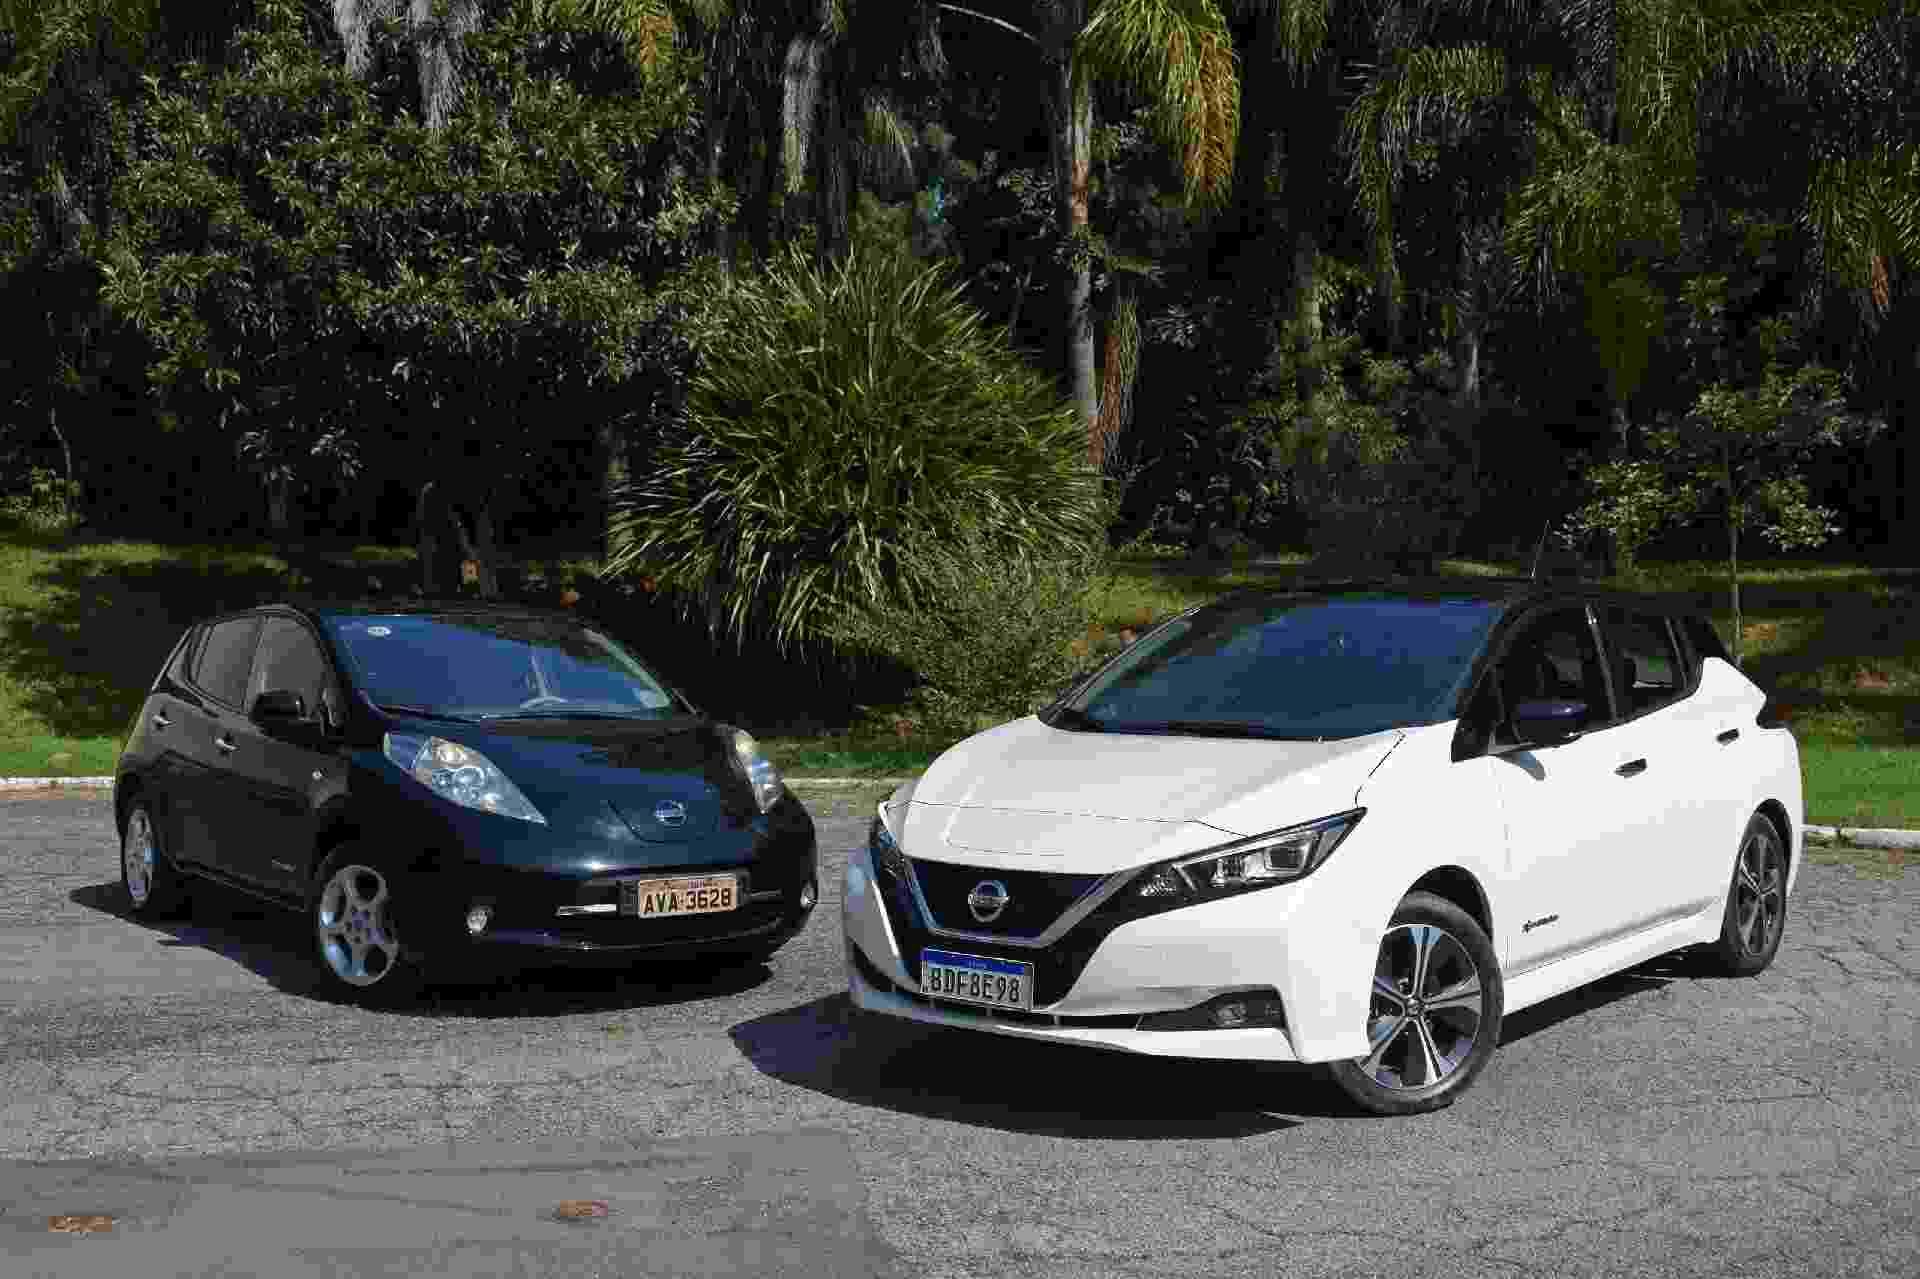 Nissan Leaf 2010 x Nissan Leaf 2020 - Murilo Góes/UOL